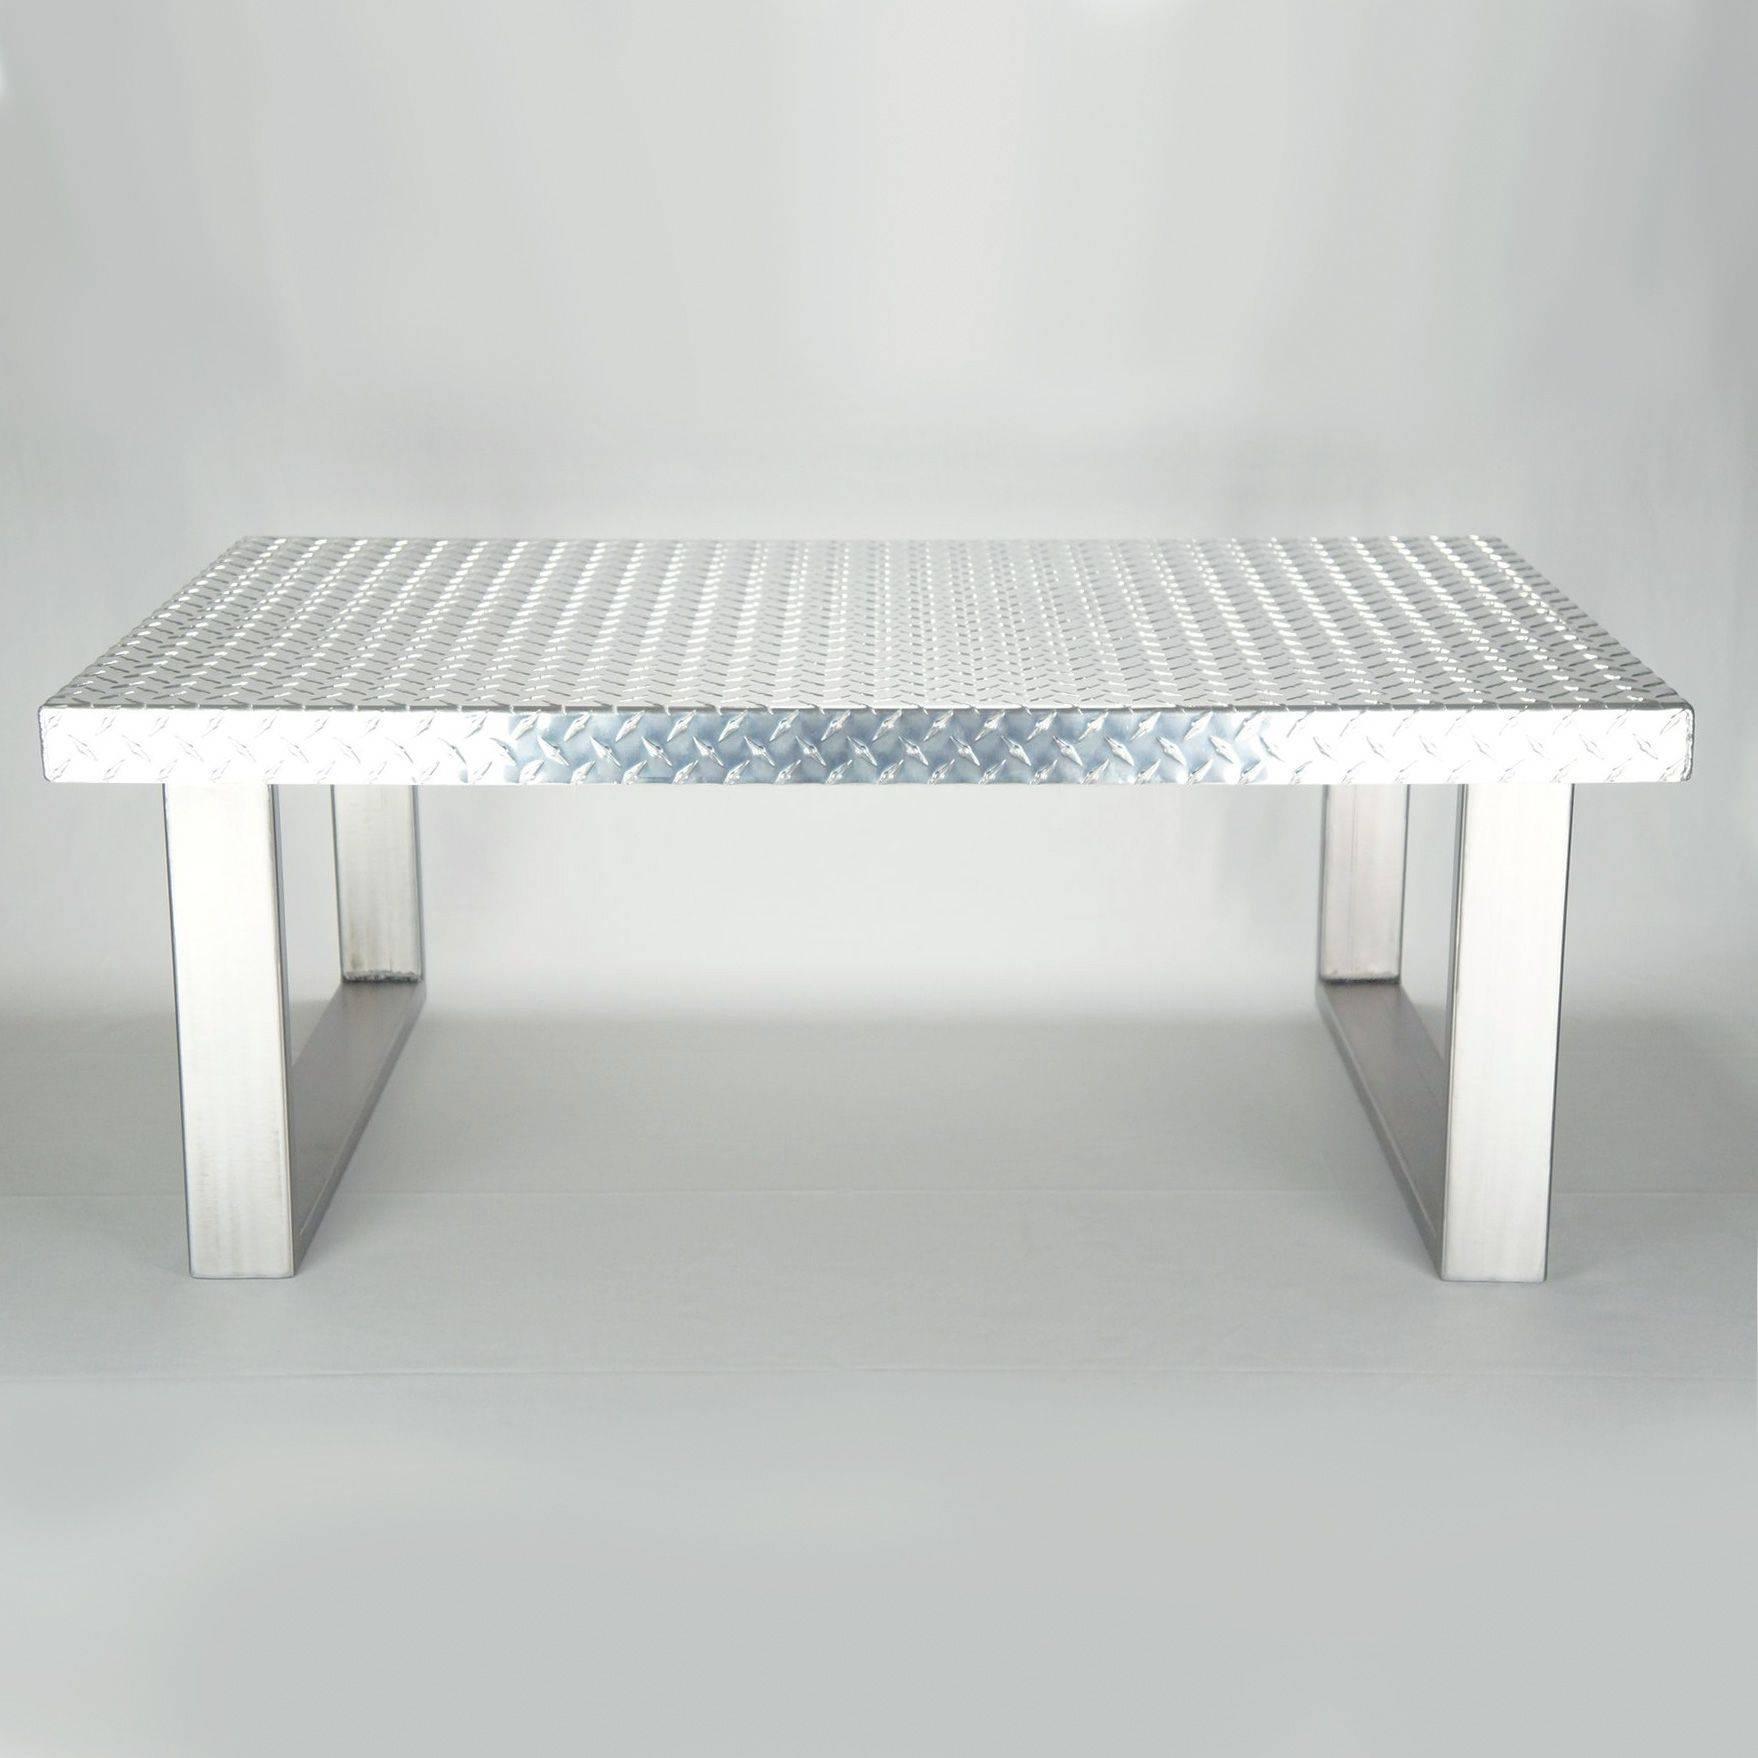 Custom Coffee Tables | Handmade Wood Coffee Tables | Custommade throughout Metal Coffee Tables (Image 15 of 30)